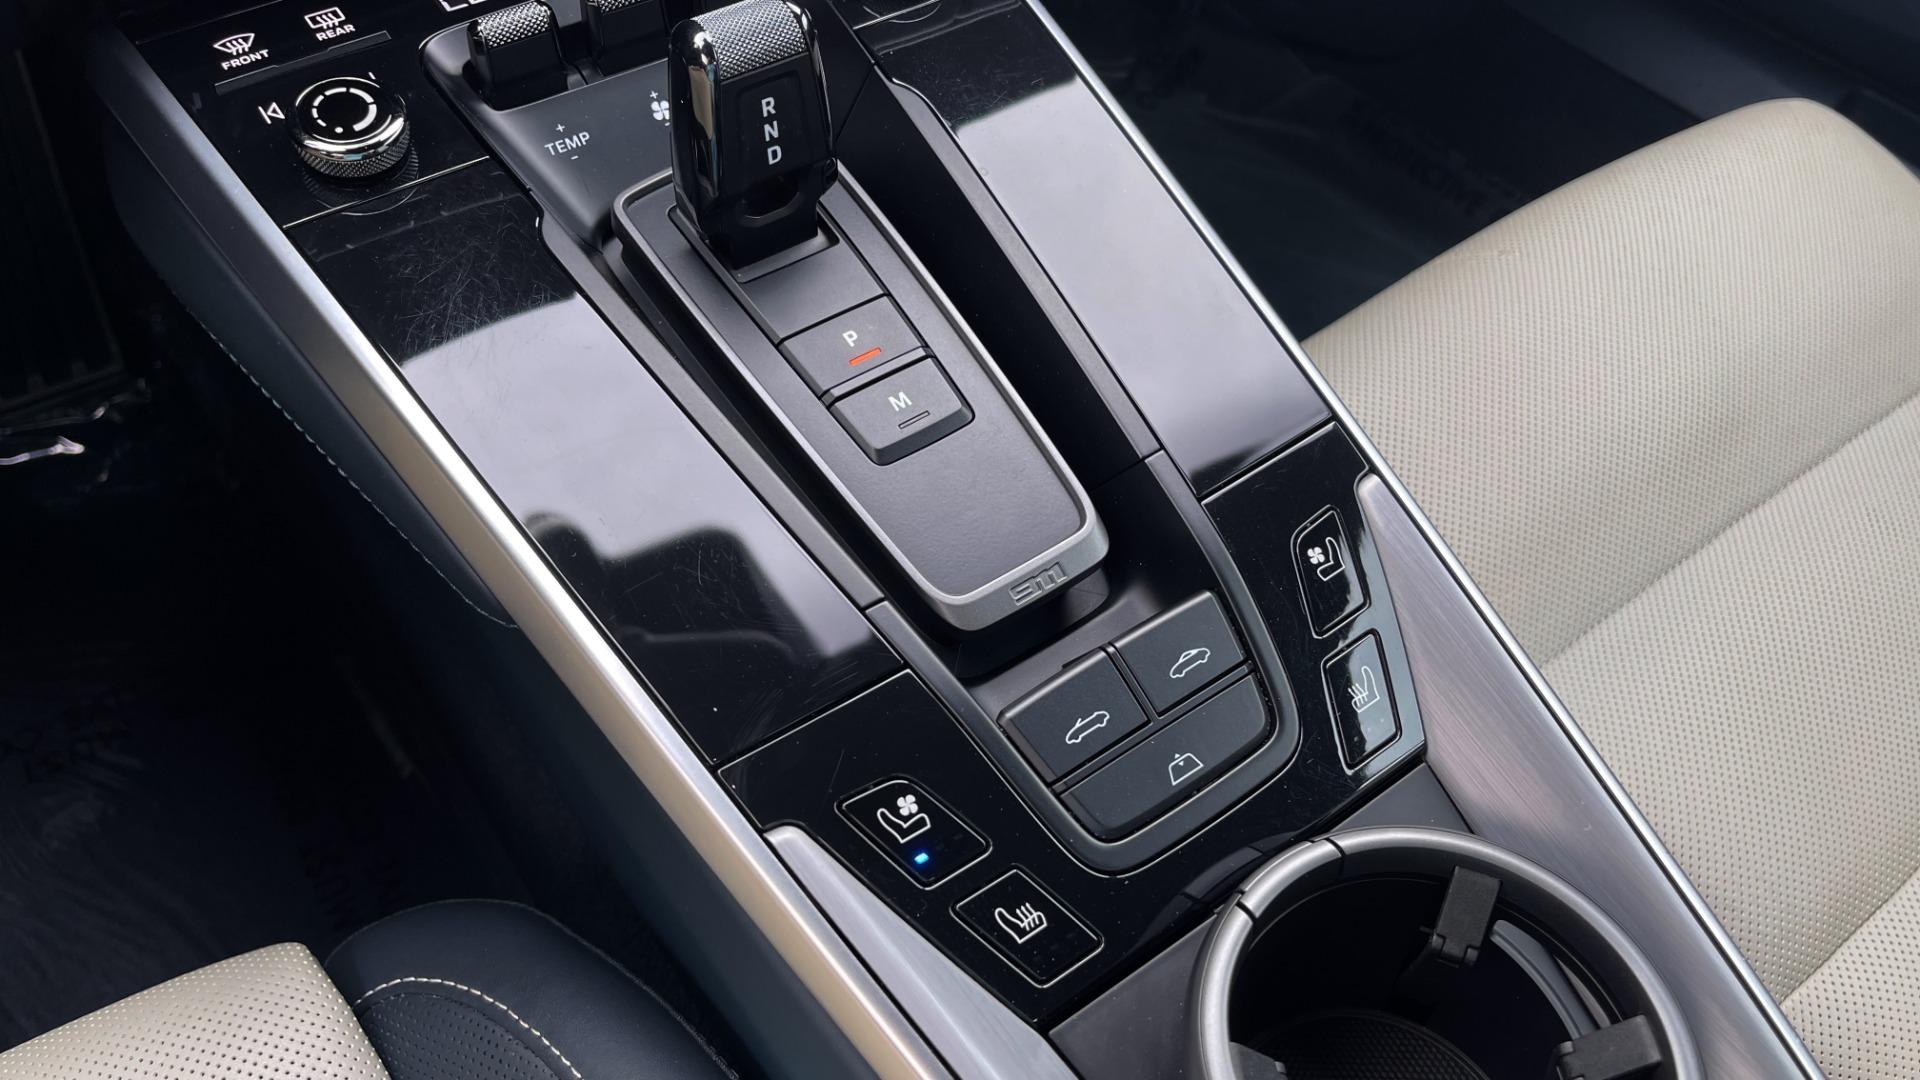 Used 2020 Porsche 911 CARRERA 4S CABRIOLET PREMIUM SPORT PKG / NAV / BOSE / LIGHT DESIGN PKG for sale $167,595 at Formula Imports in Charlotte NC 28227 63